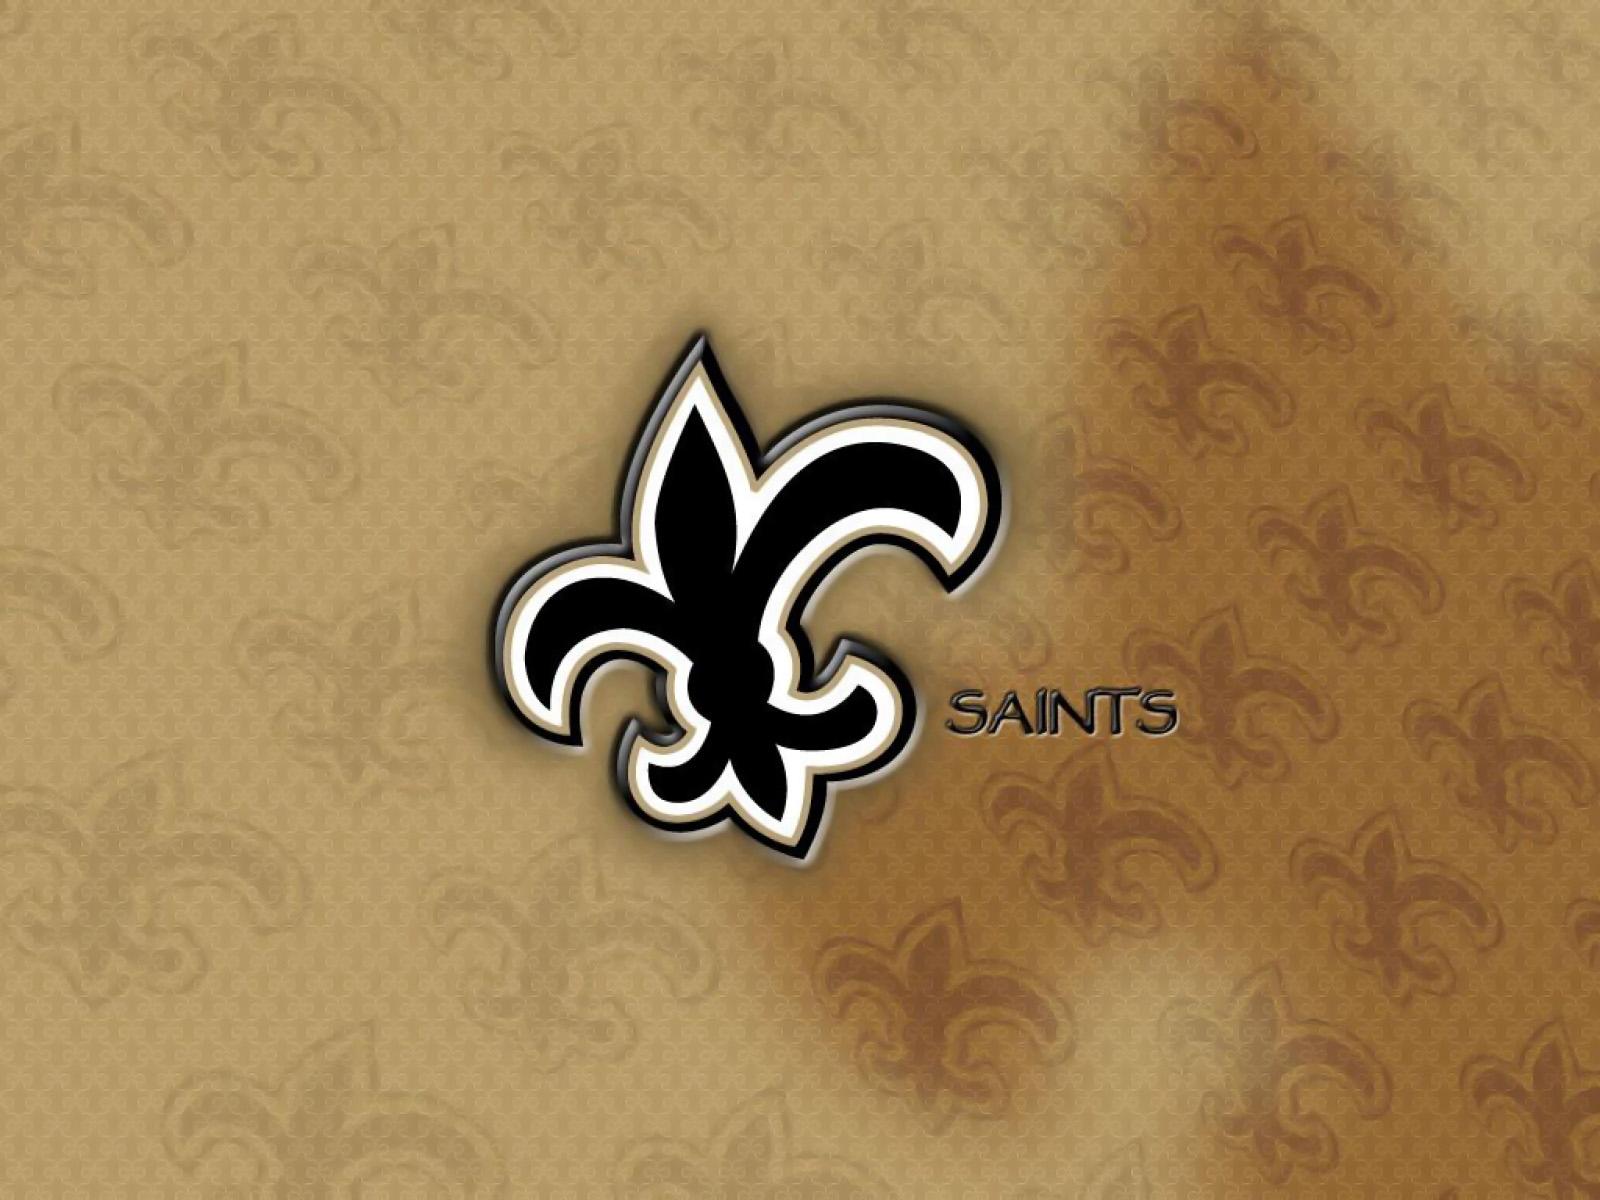 New Orleans Saints Wallpaper Best Logo cute Wallpapers 1600x1200